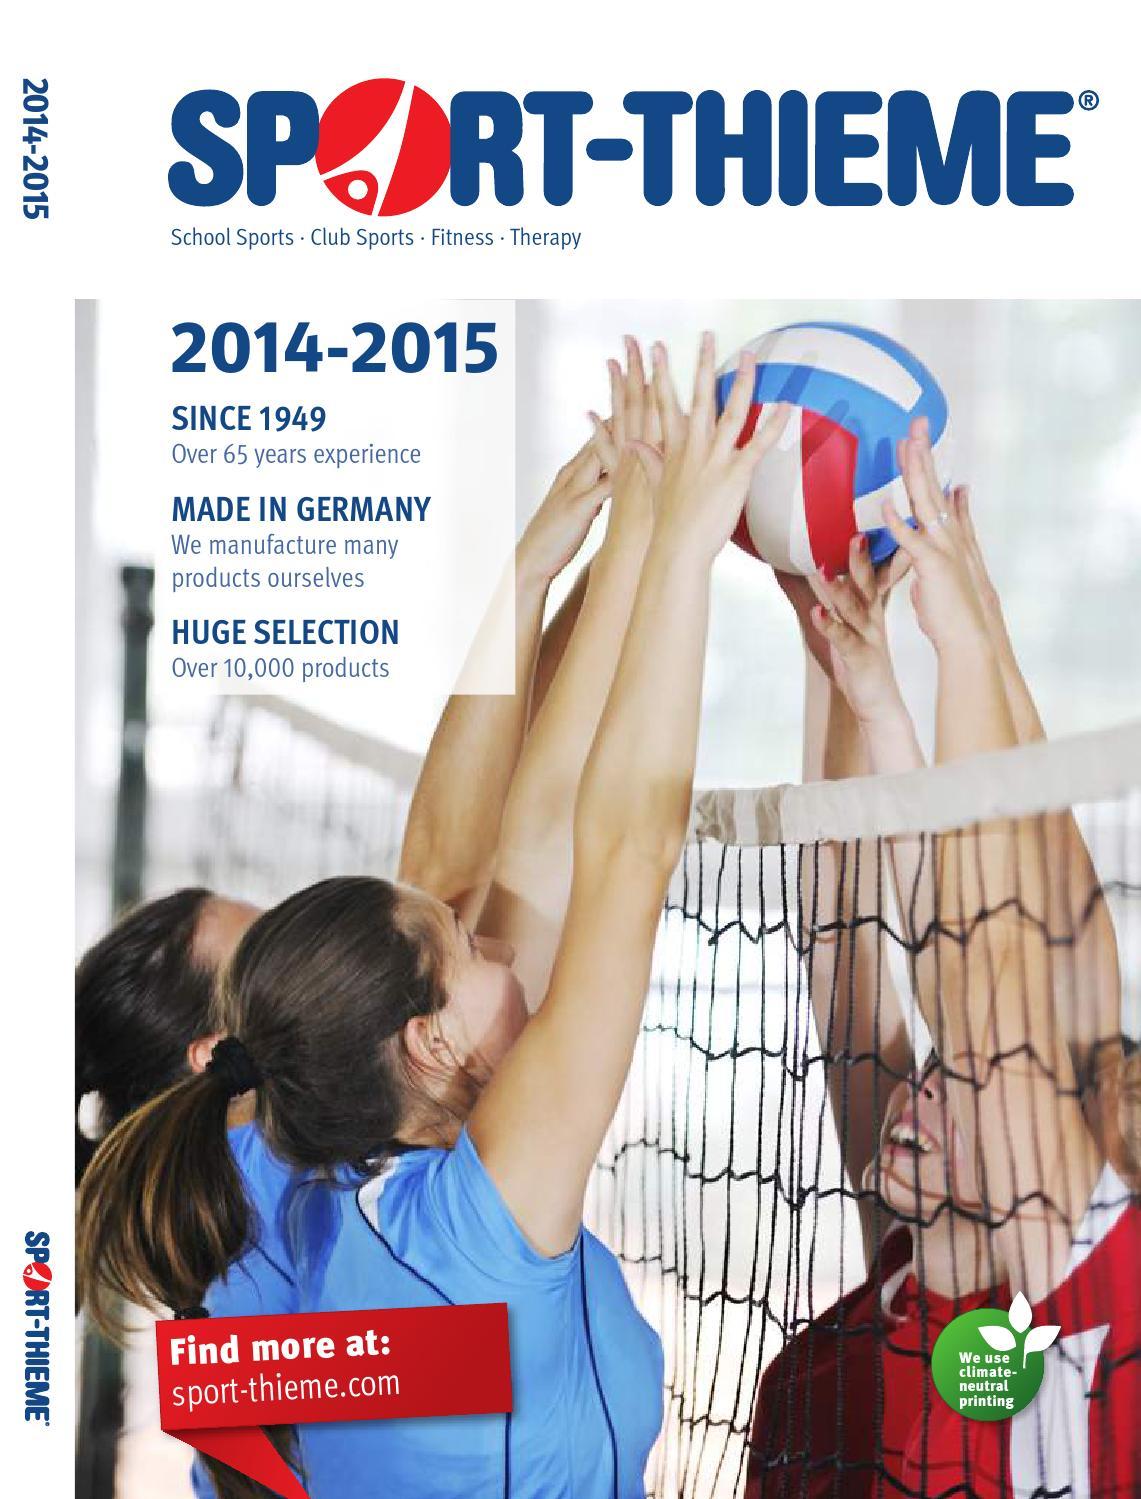 Sport-Thieme 2014-2015 by Á. Óskarsson ehf. - issuu 06dab28ba